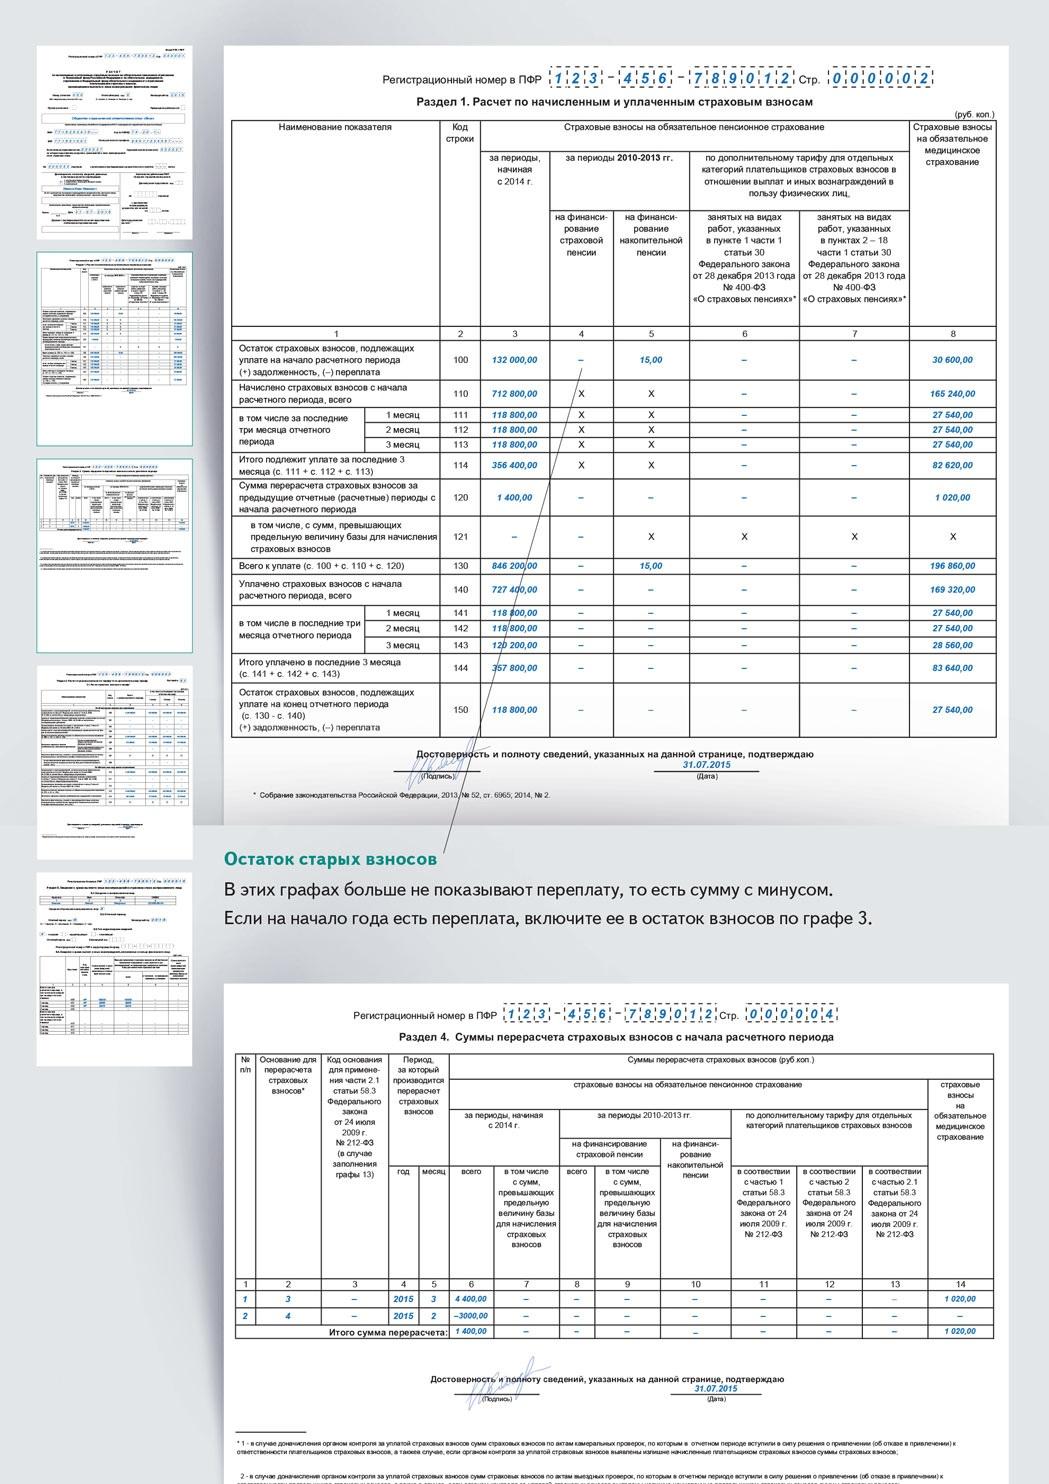 бланк отчетности по фсс за 2 кв. 2013г.